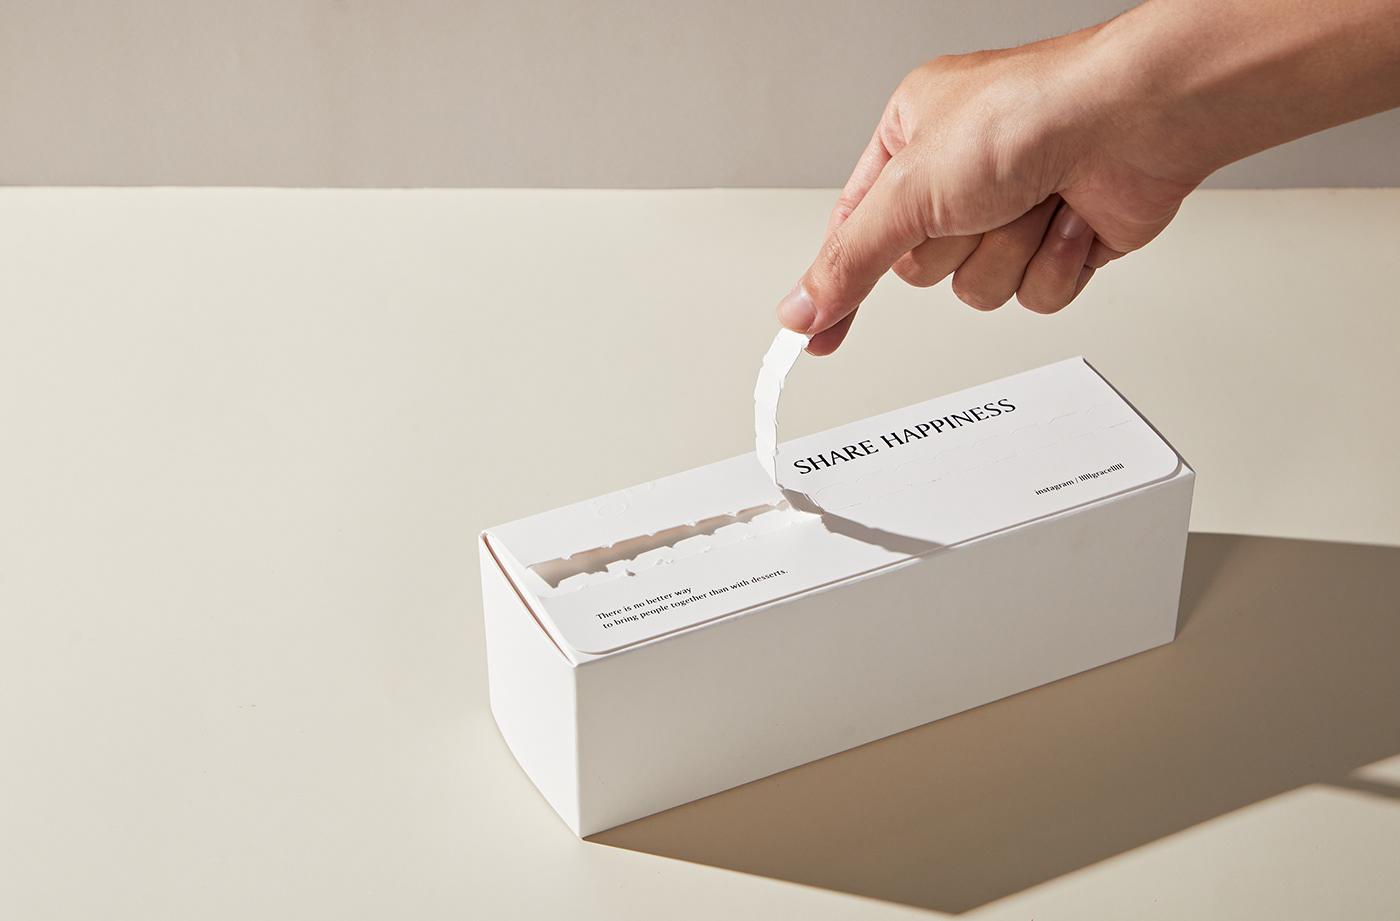 cake dessert Packaging print White 包裝 甜點 蛋糕